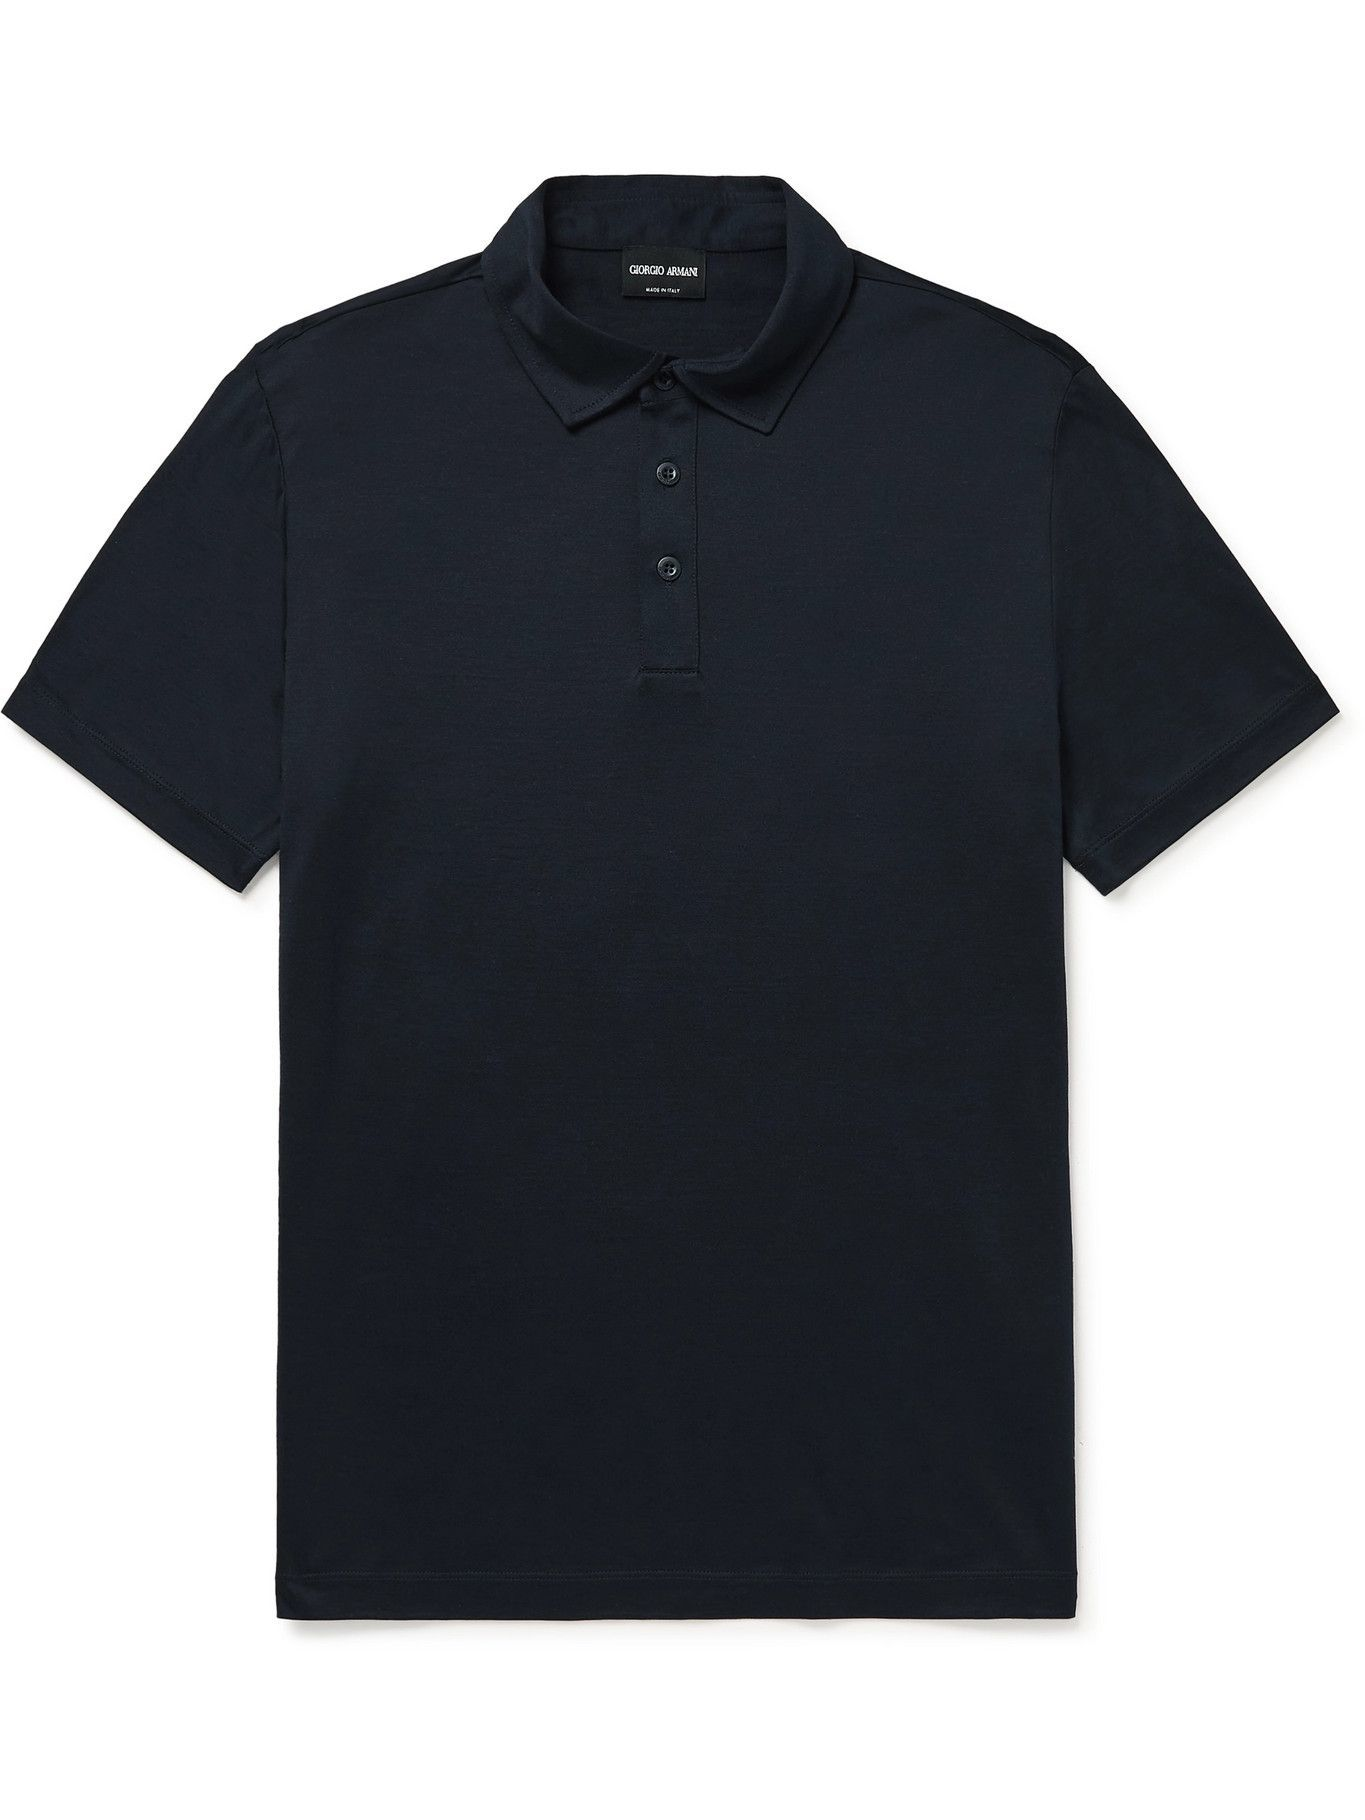 GIORGIO ARMANI - Slim-Fit Mélange Silk and Cotton-Blend Polo Shirt - Blue